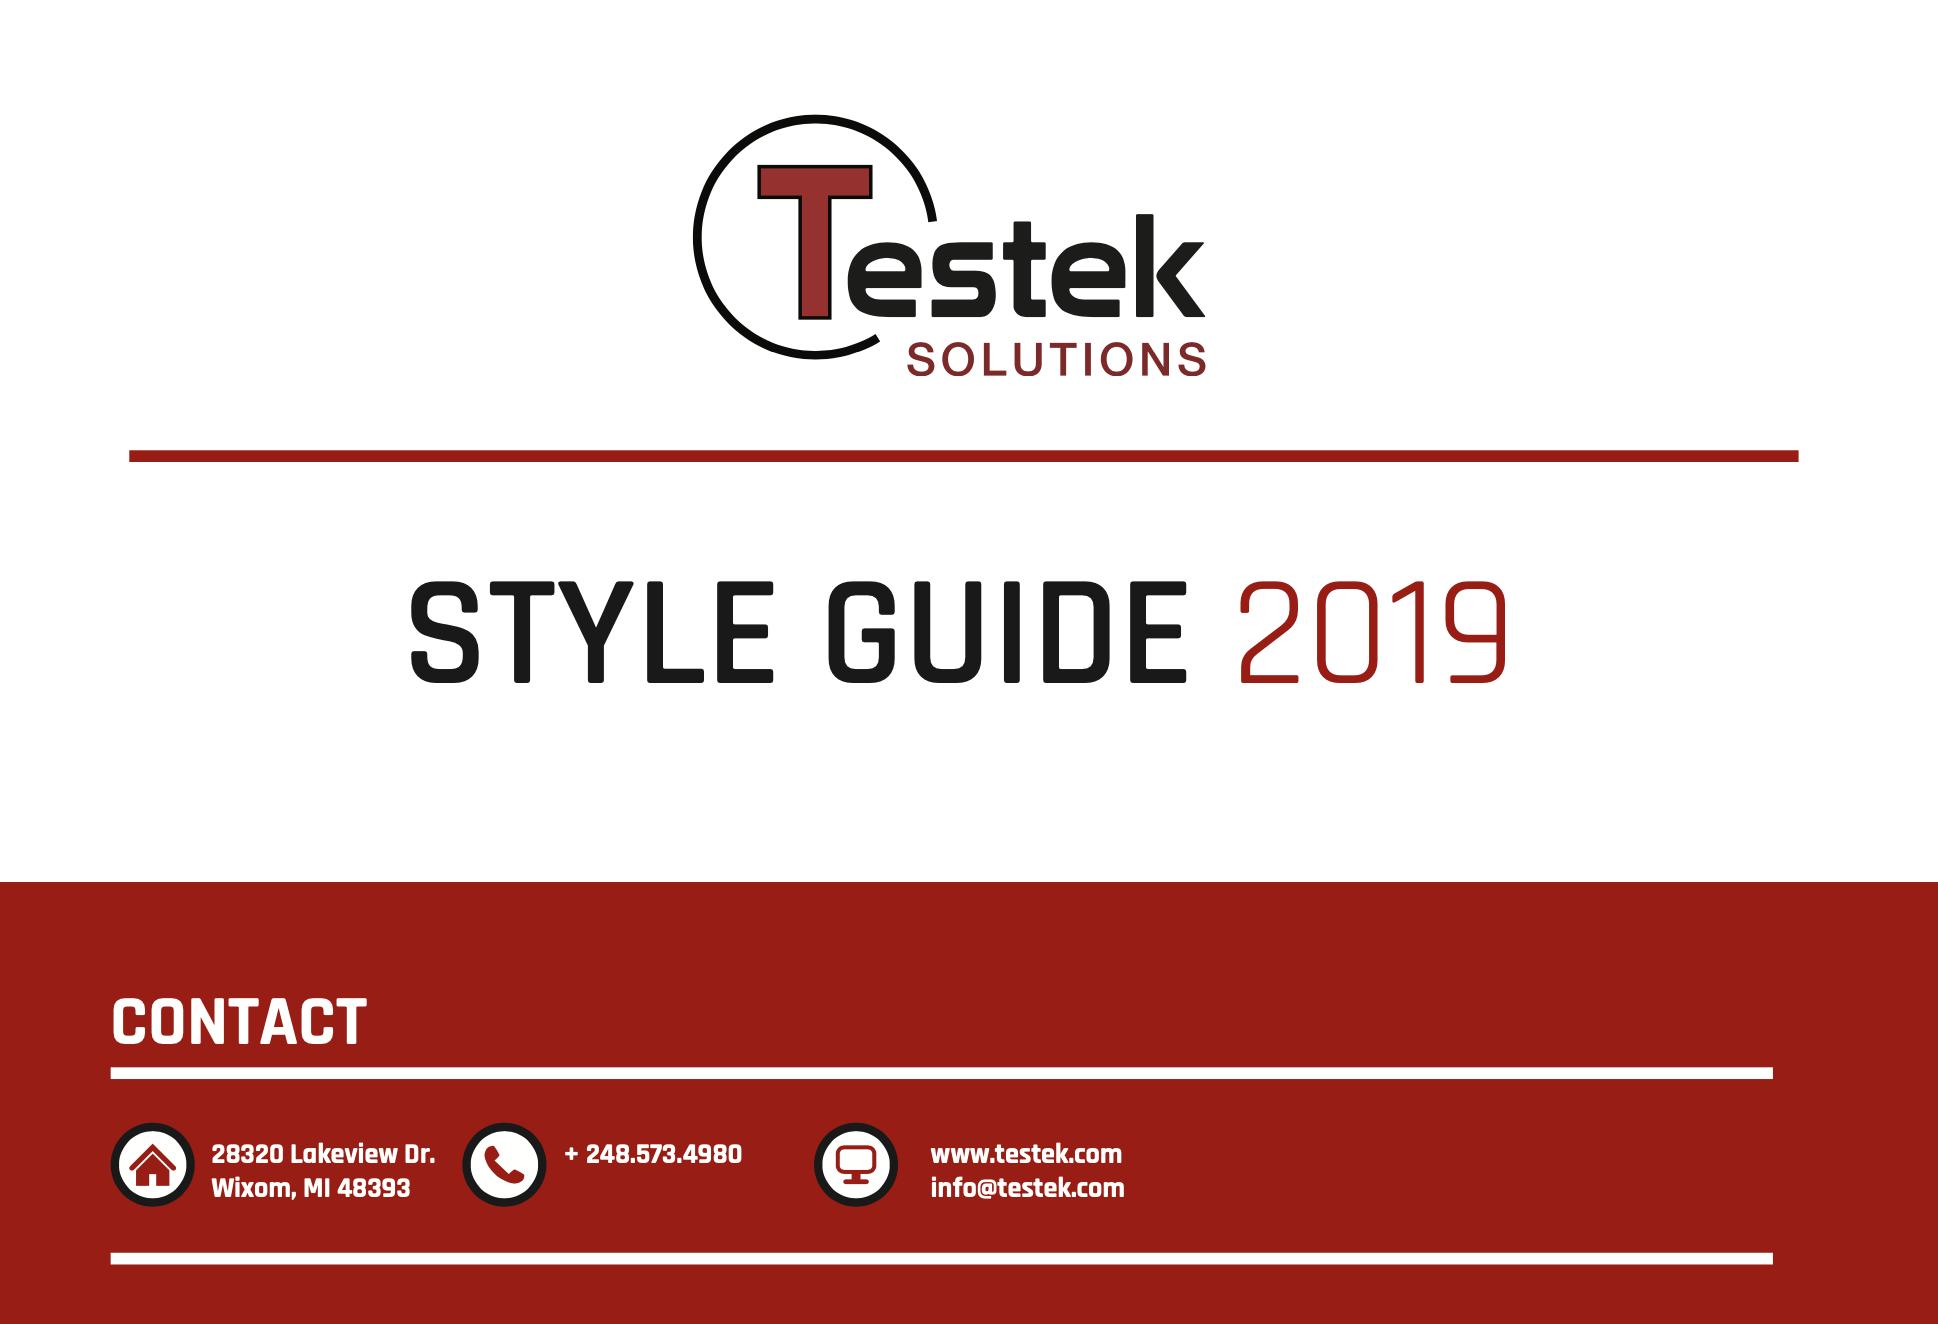 testek style guide